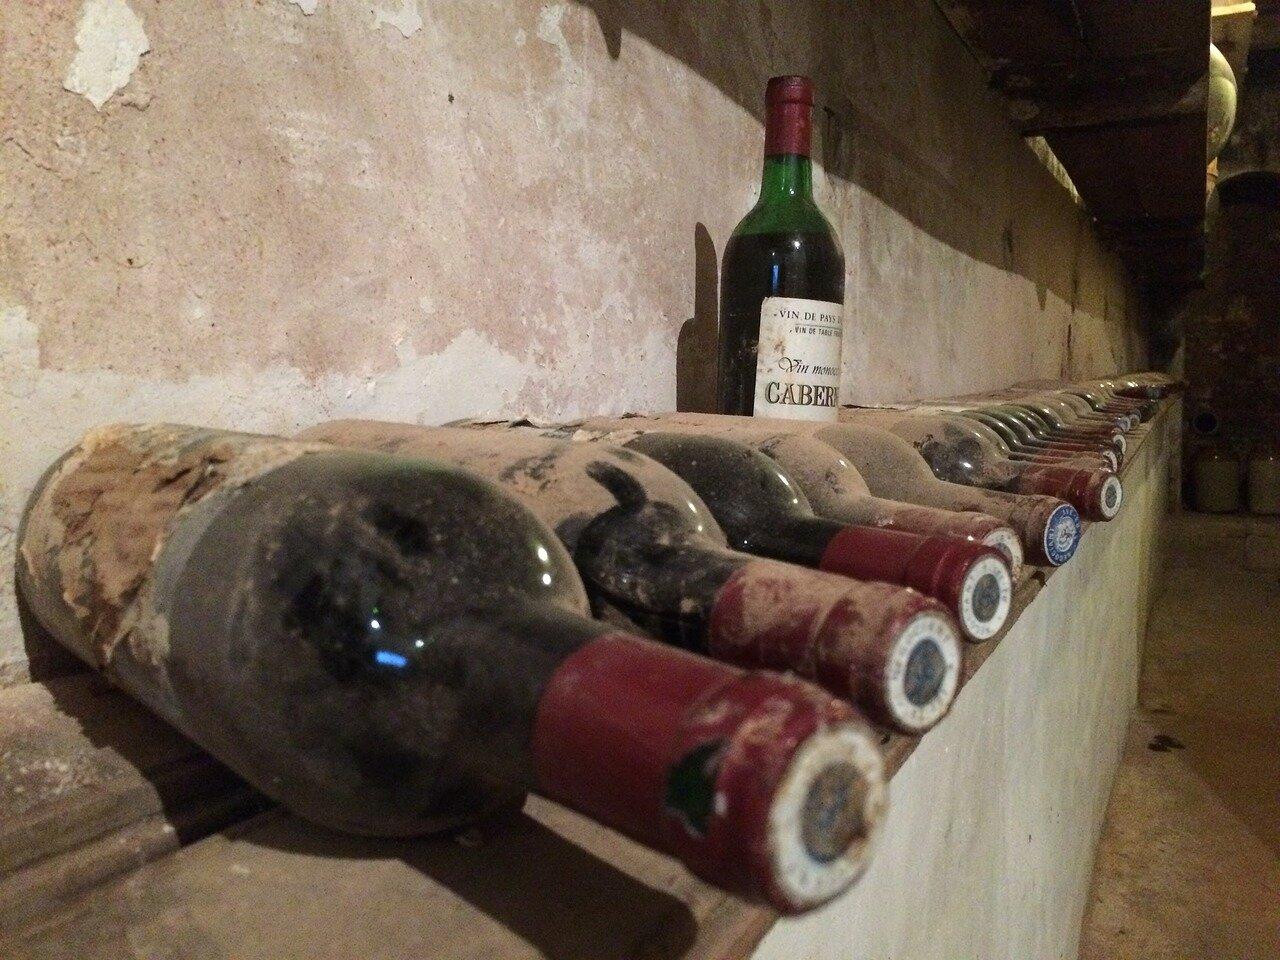 How long should I keep my fine wine bottles aging?